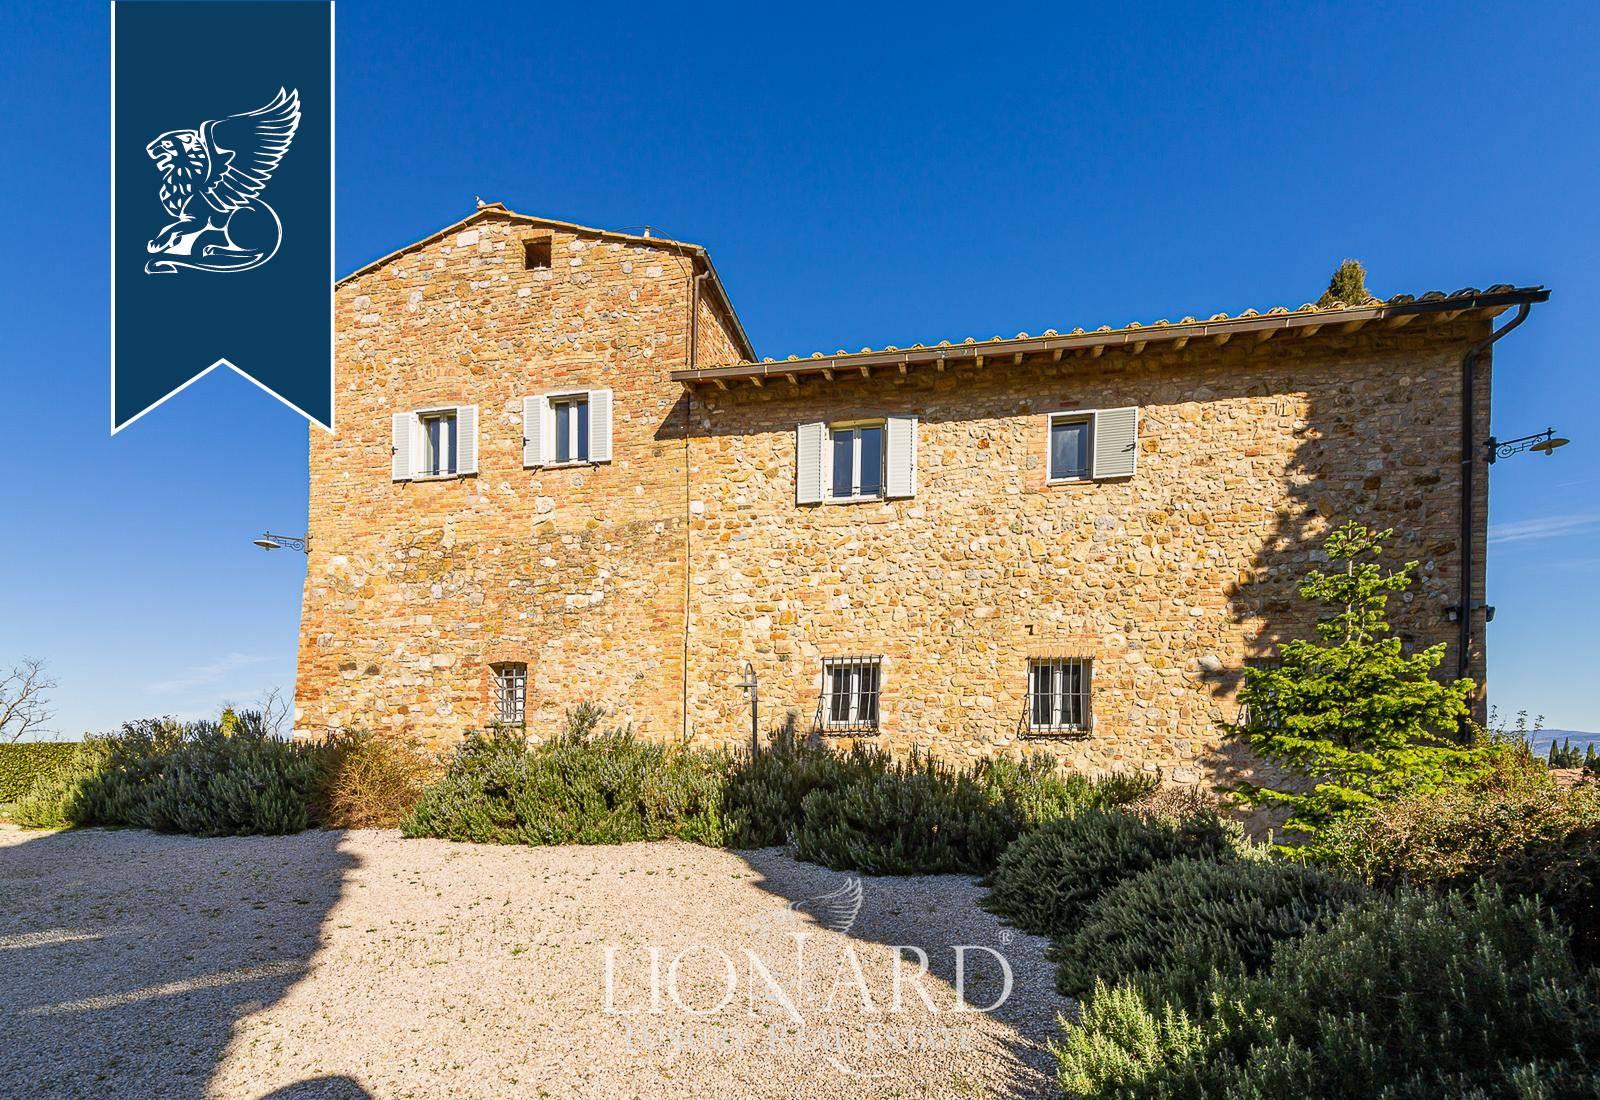 Agriturismo in Vendita a San Gimignano: 0 locali, 649 mq - Foto 8